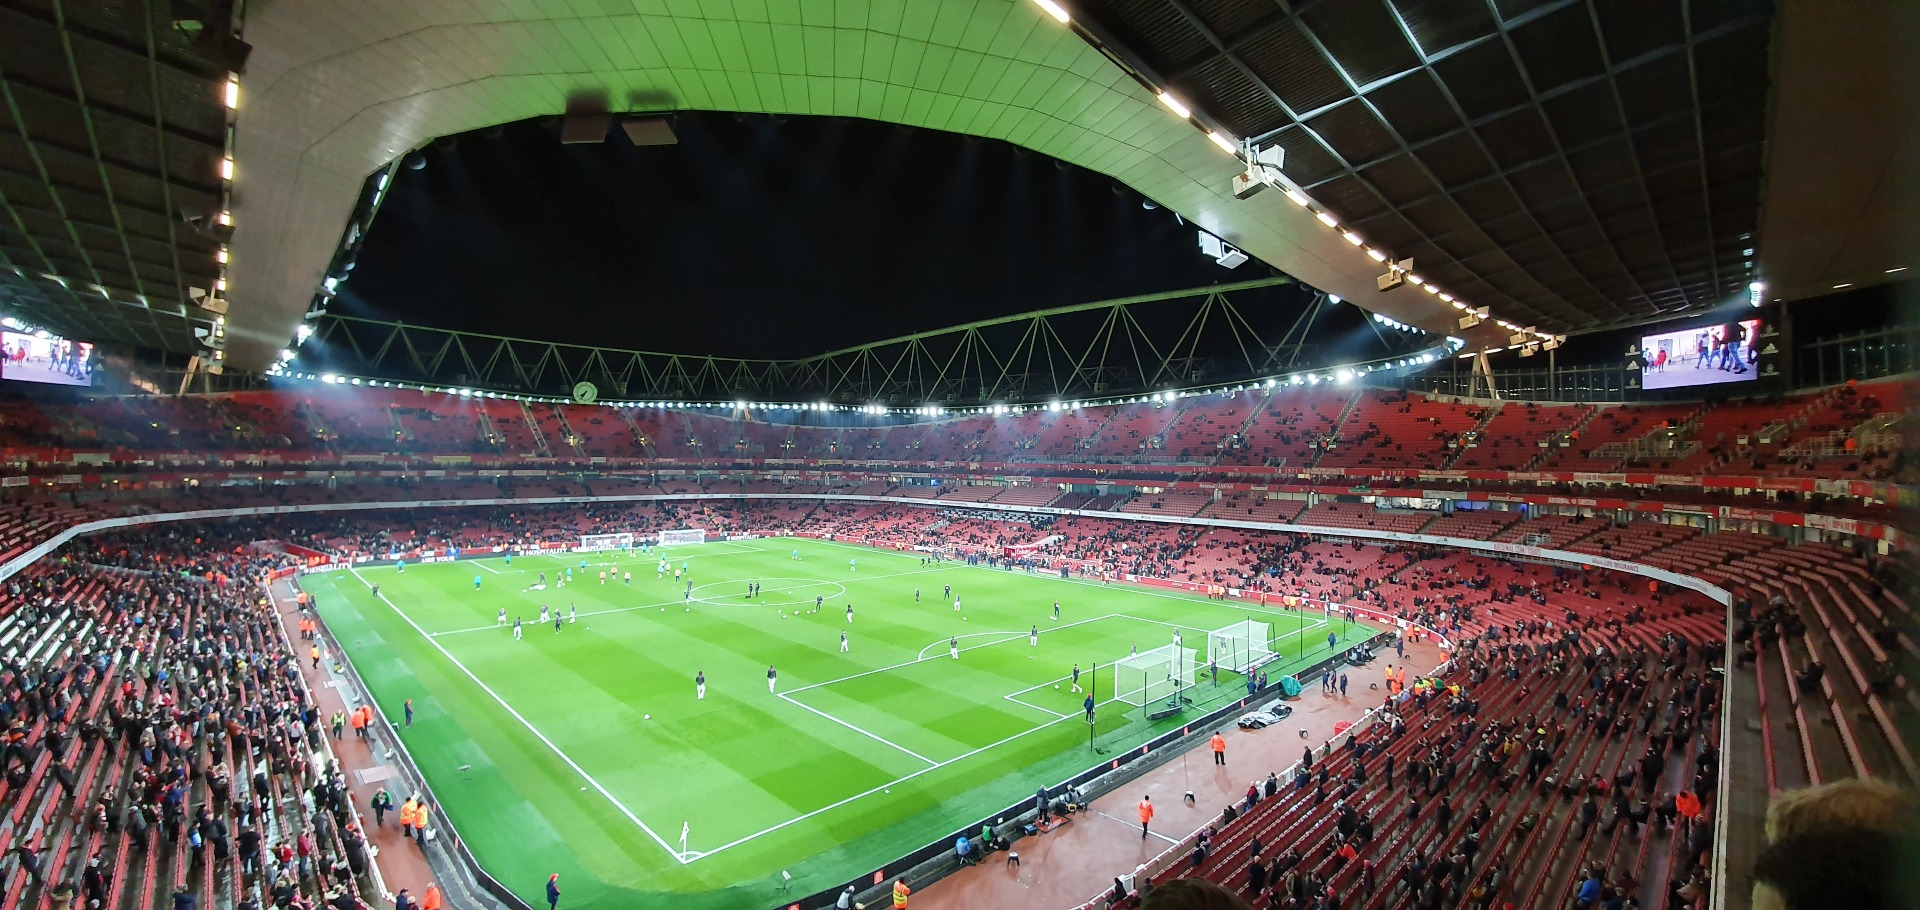 Emirates Stadium Section 106 Row 2 Seat 417